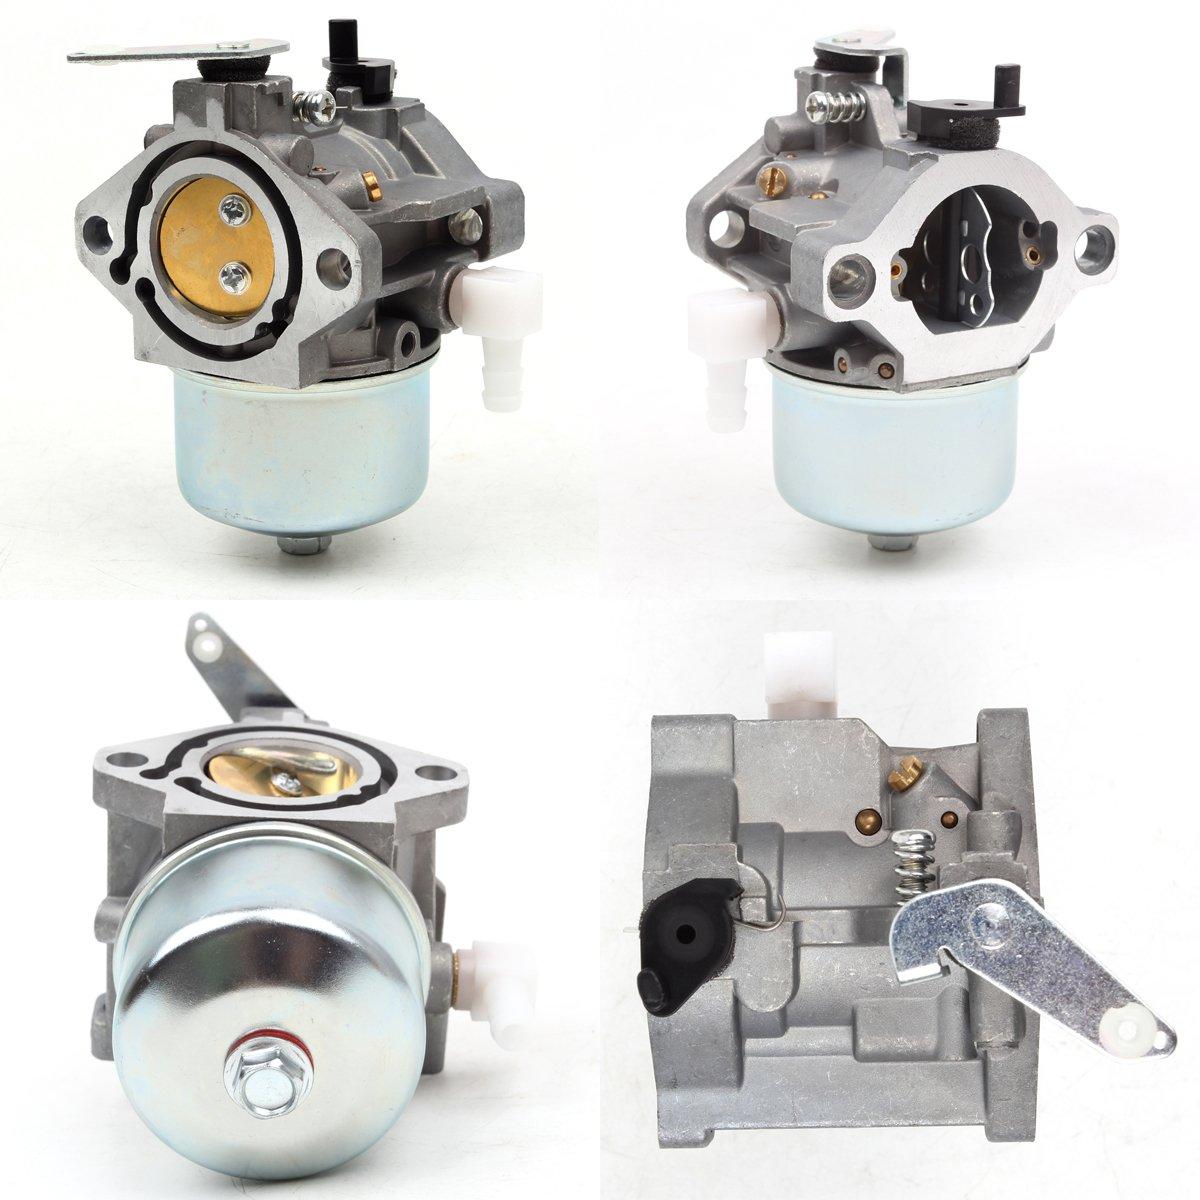 Wingsmoto Carburetor 690119 694526 690115 690111 fit Generator with Briggs /& Stratton 10HP Engine Gererac PowerBoss 5500 Coleman Powermate 5500